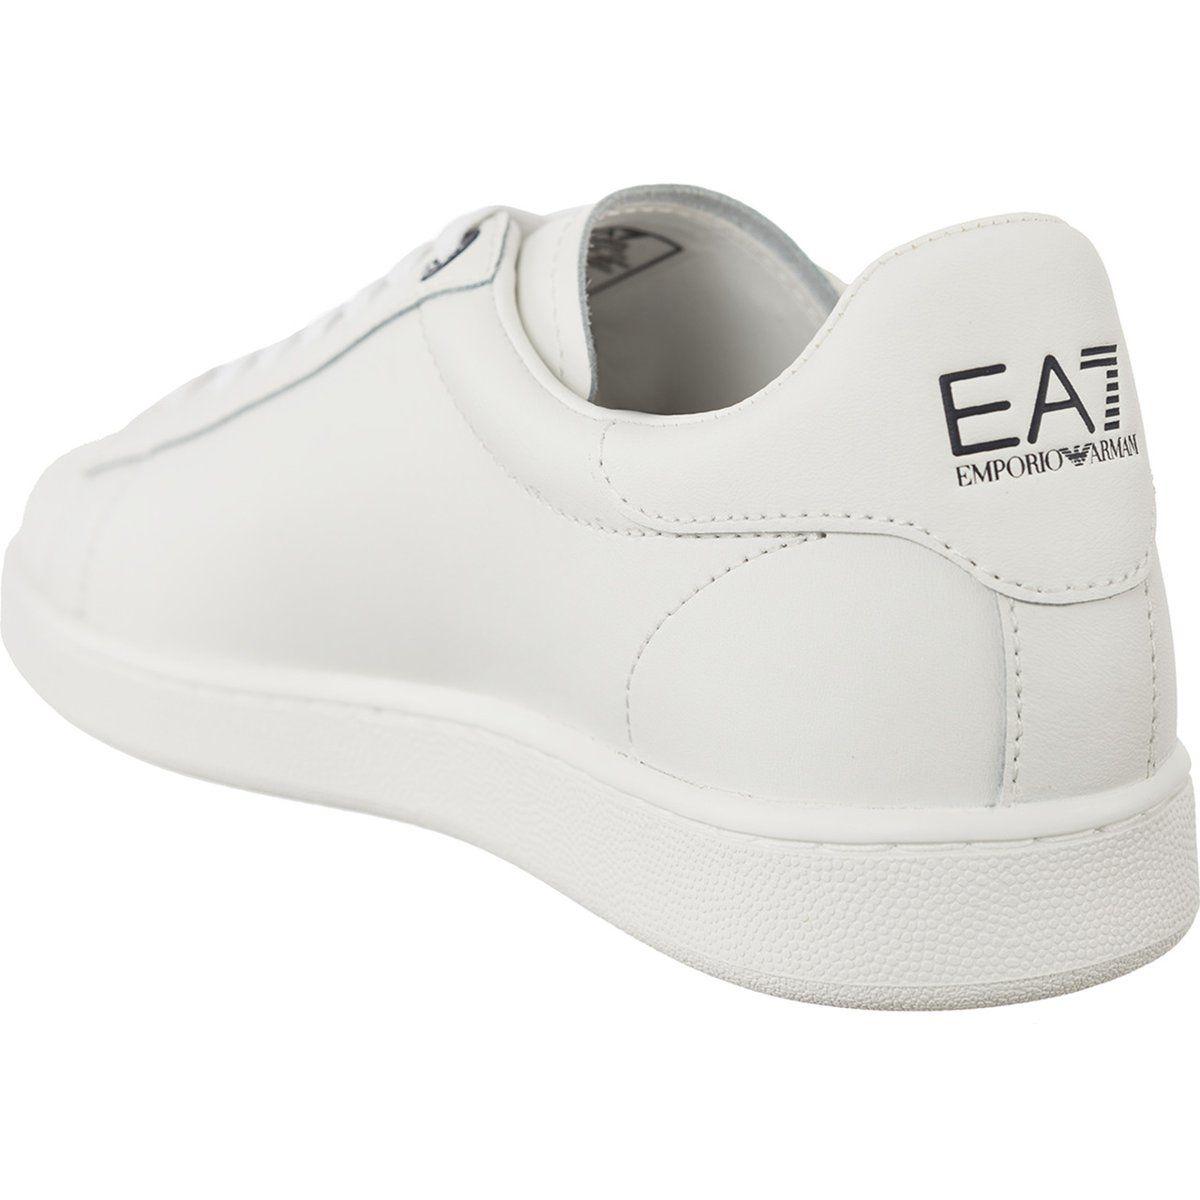 Trampki Meskie Ea7emporioarmani Ea7 Emporio Armani Biale Leather Sneaker 248028cc299 00010 Sneakers Leather Sneakers Slip On Sneaker